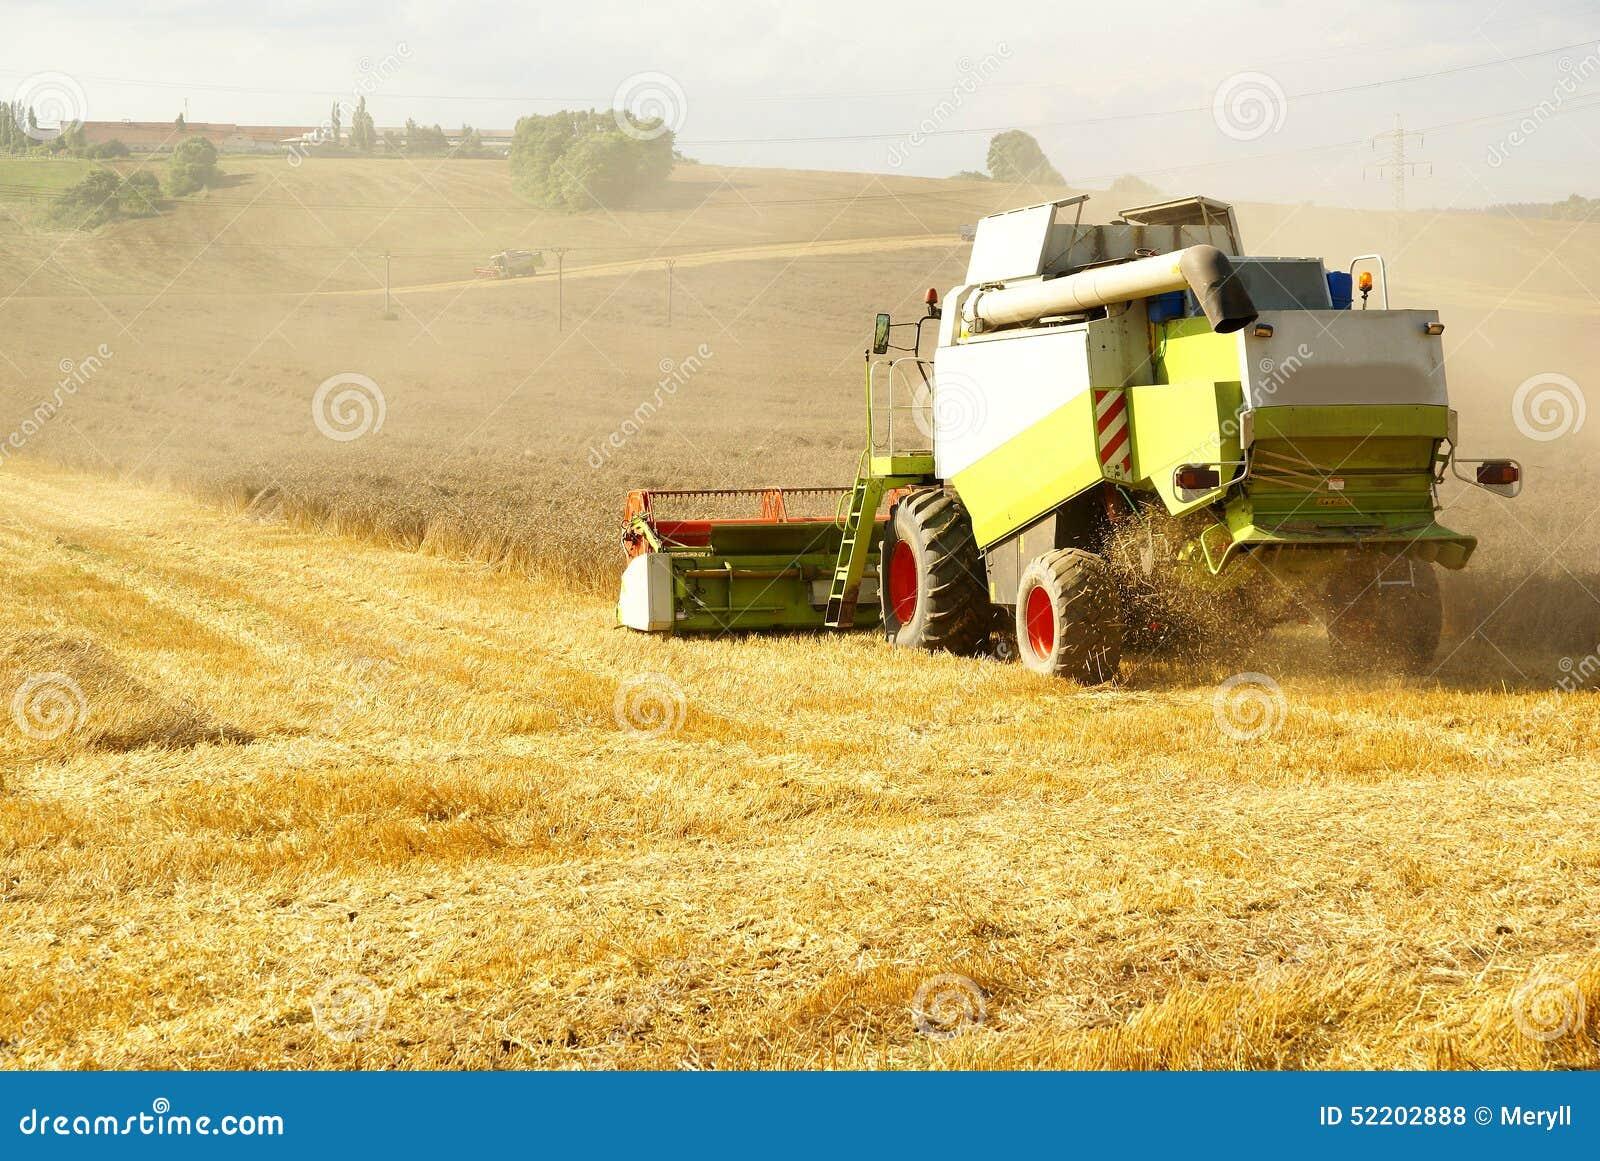 agricultural harvesting machine